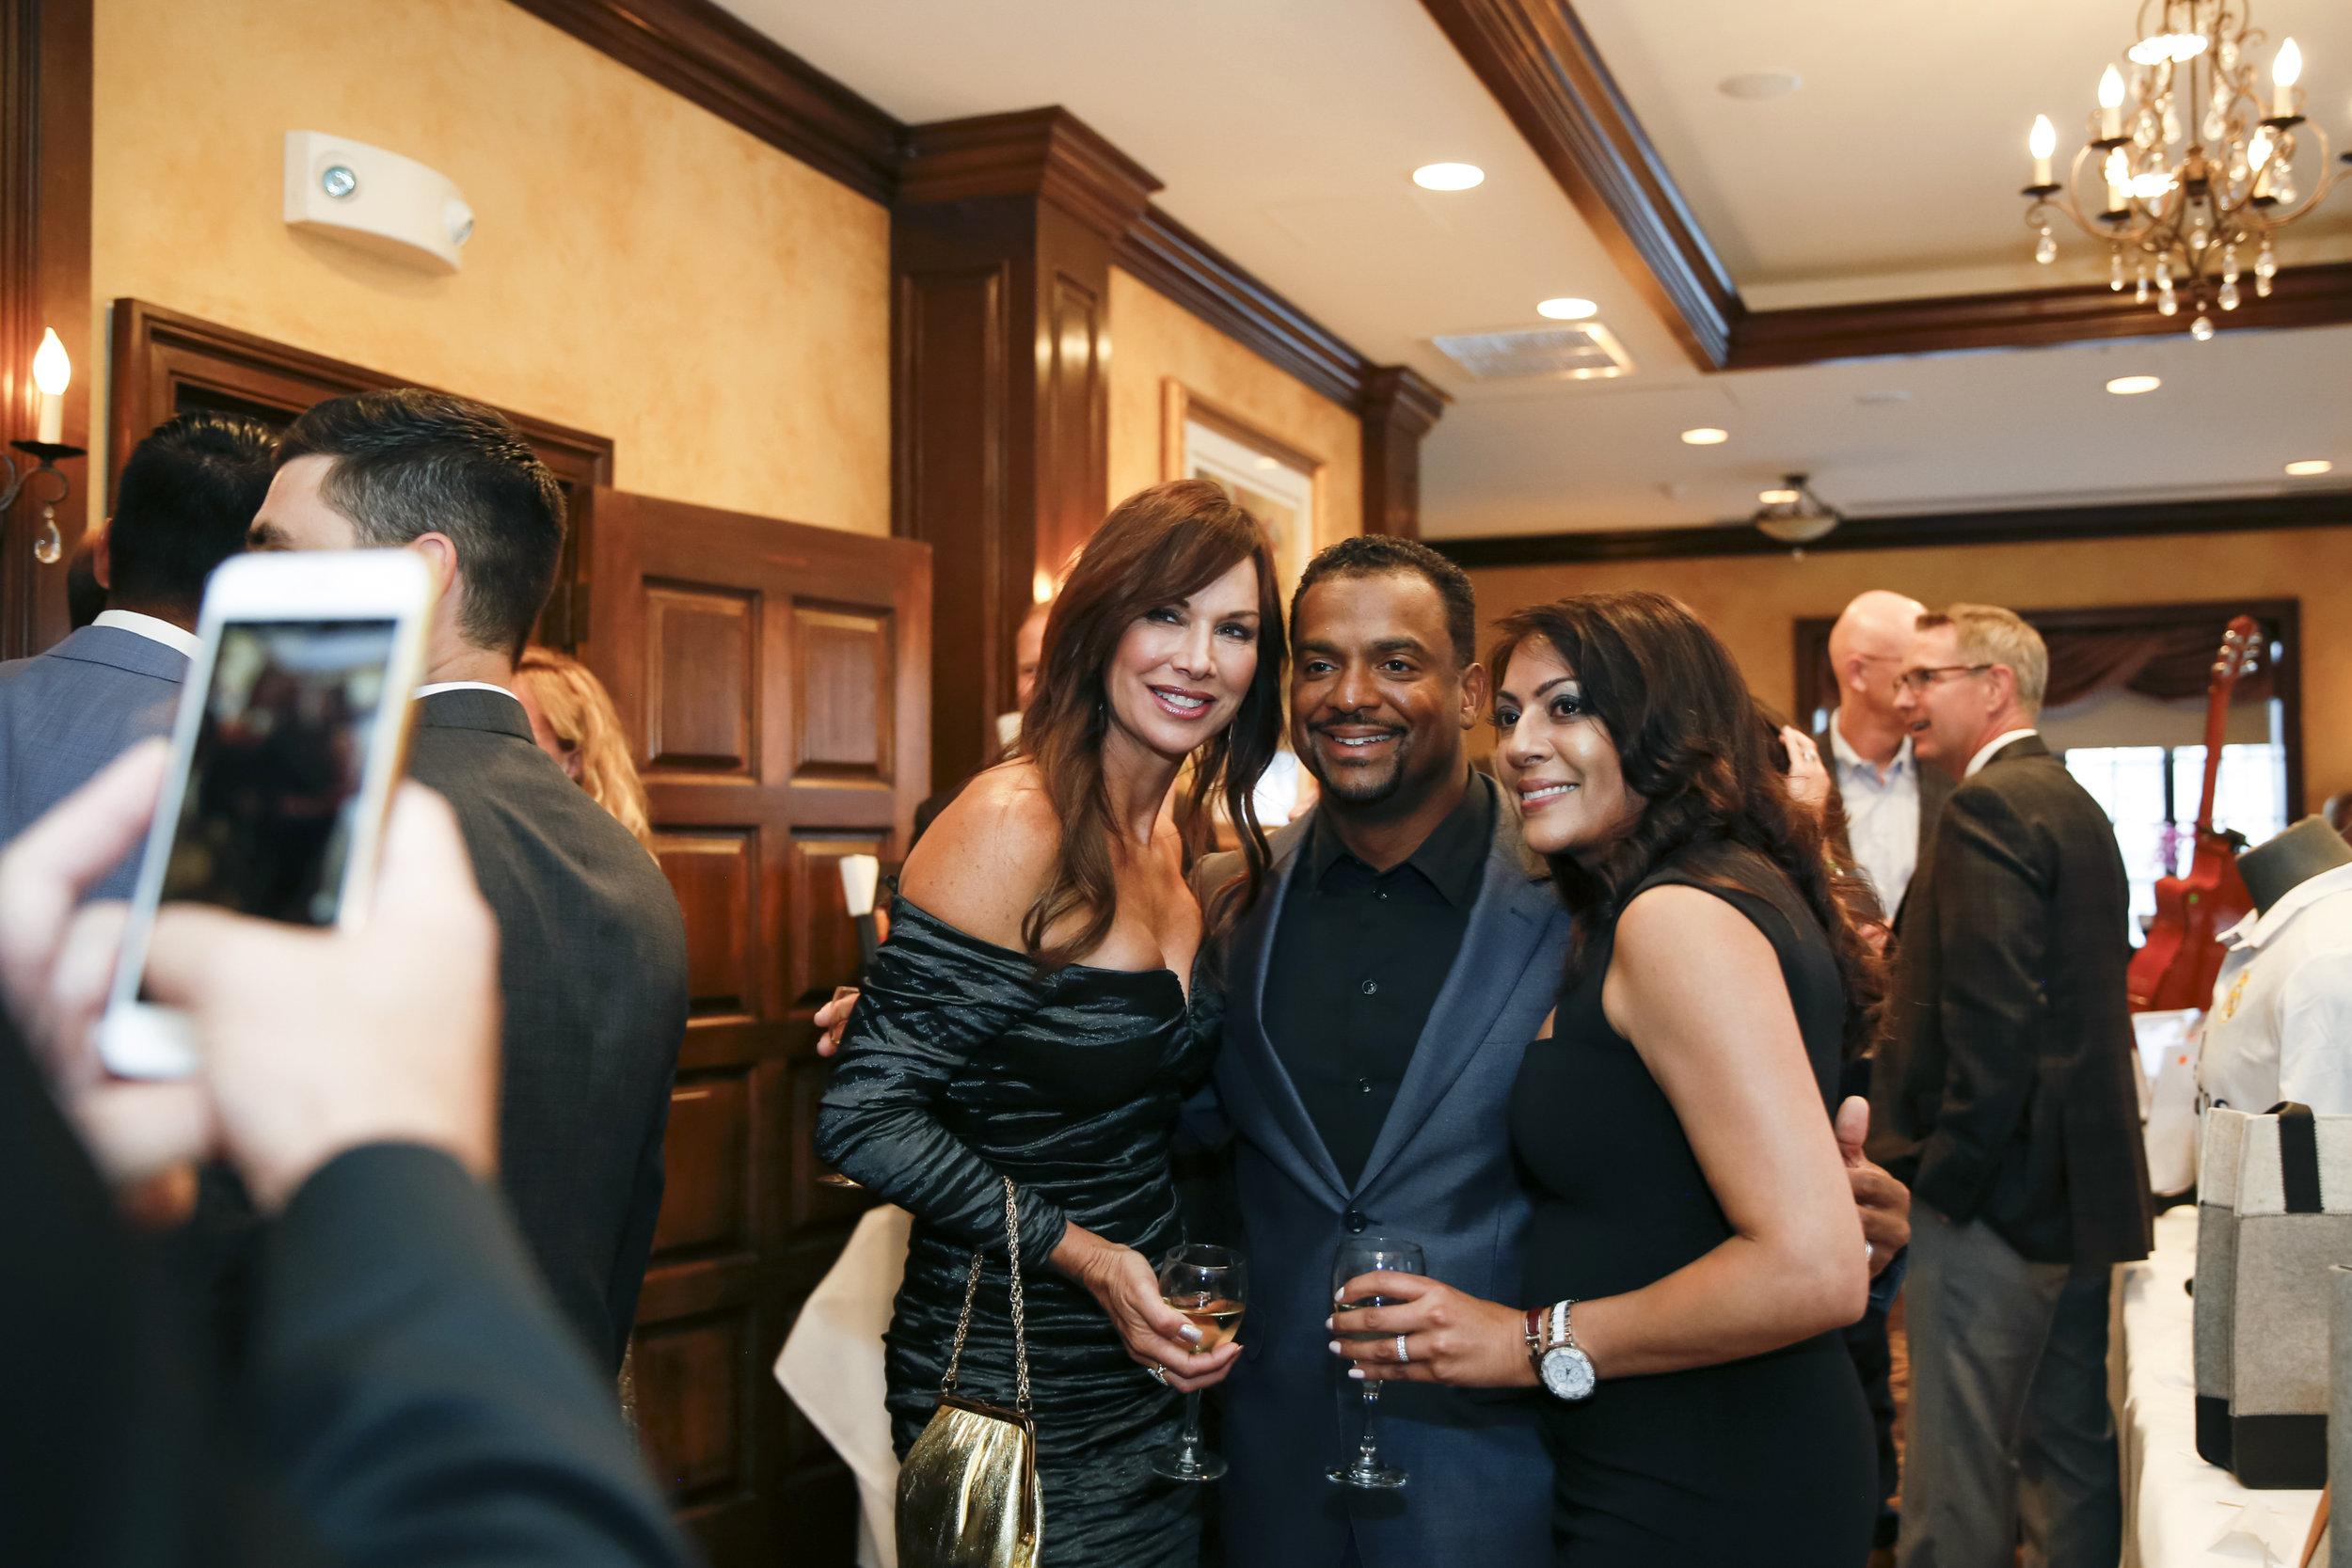 golf-give-gala-celebrity-michael-phelps-jason-day-event-photographer-madison-wi-35.jpg